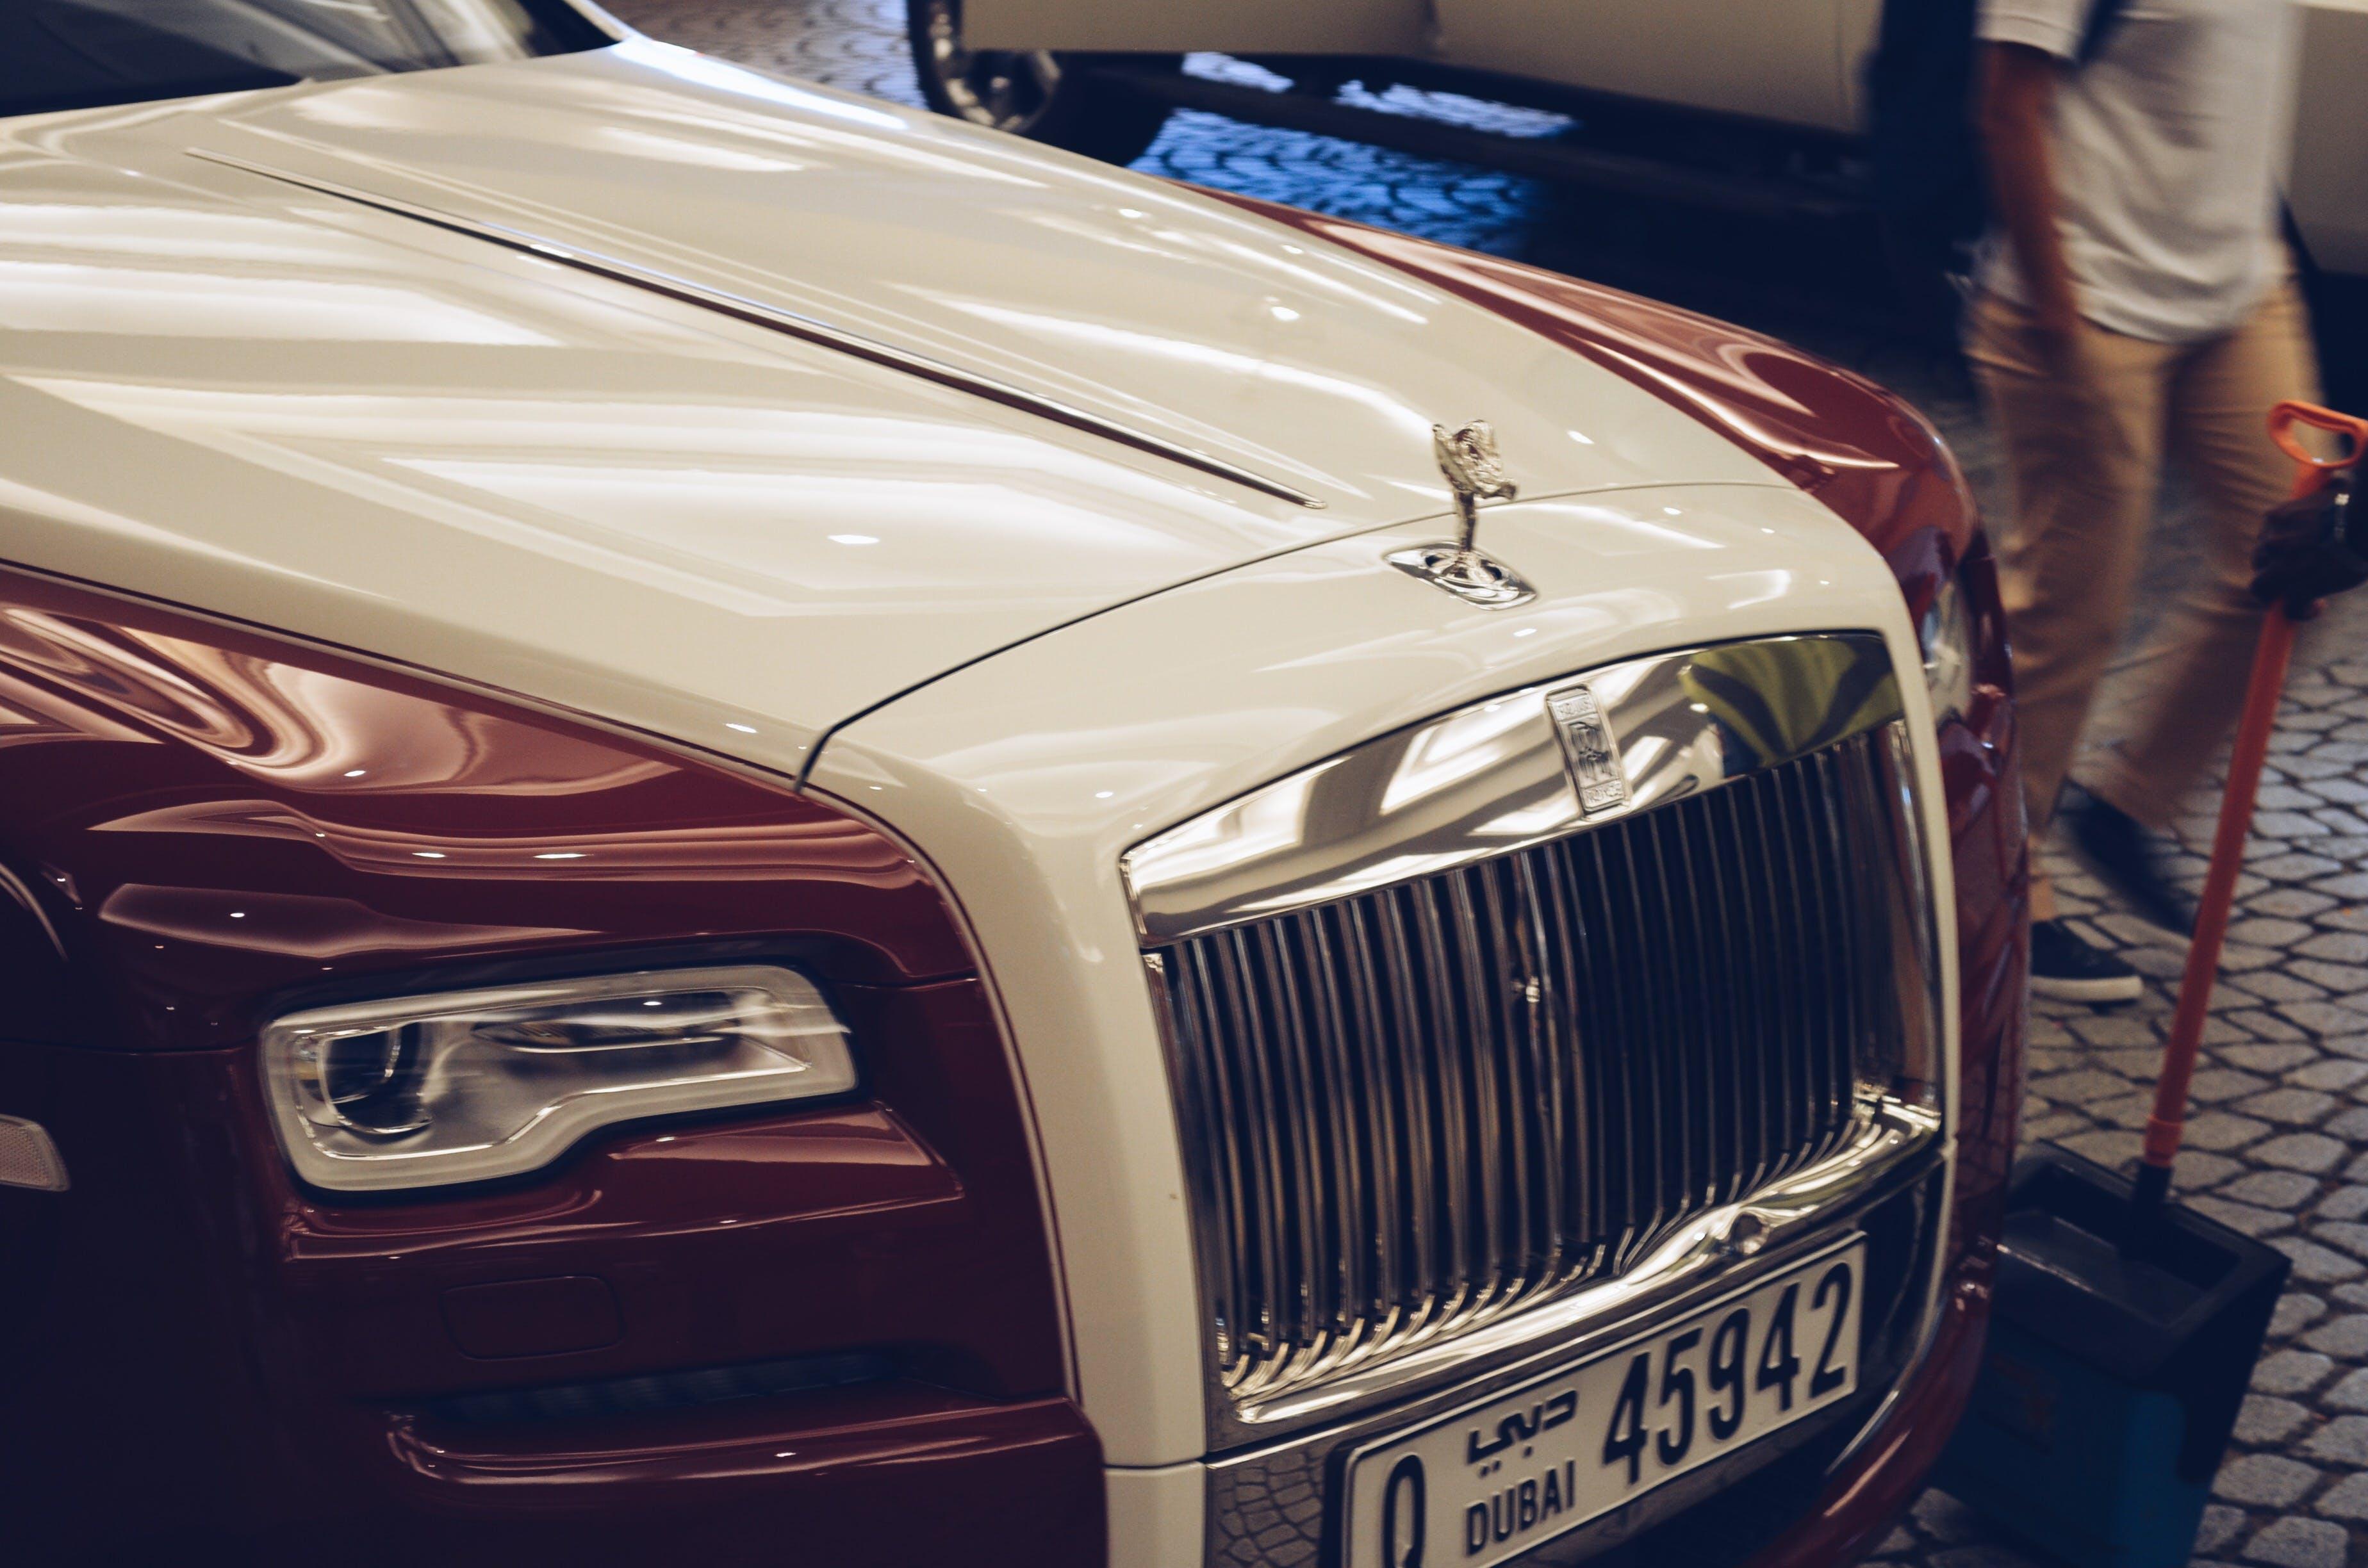 Free stock photo of car, luxury, luxury car, Rolls Royce